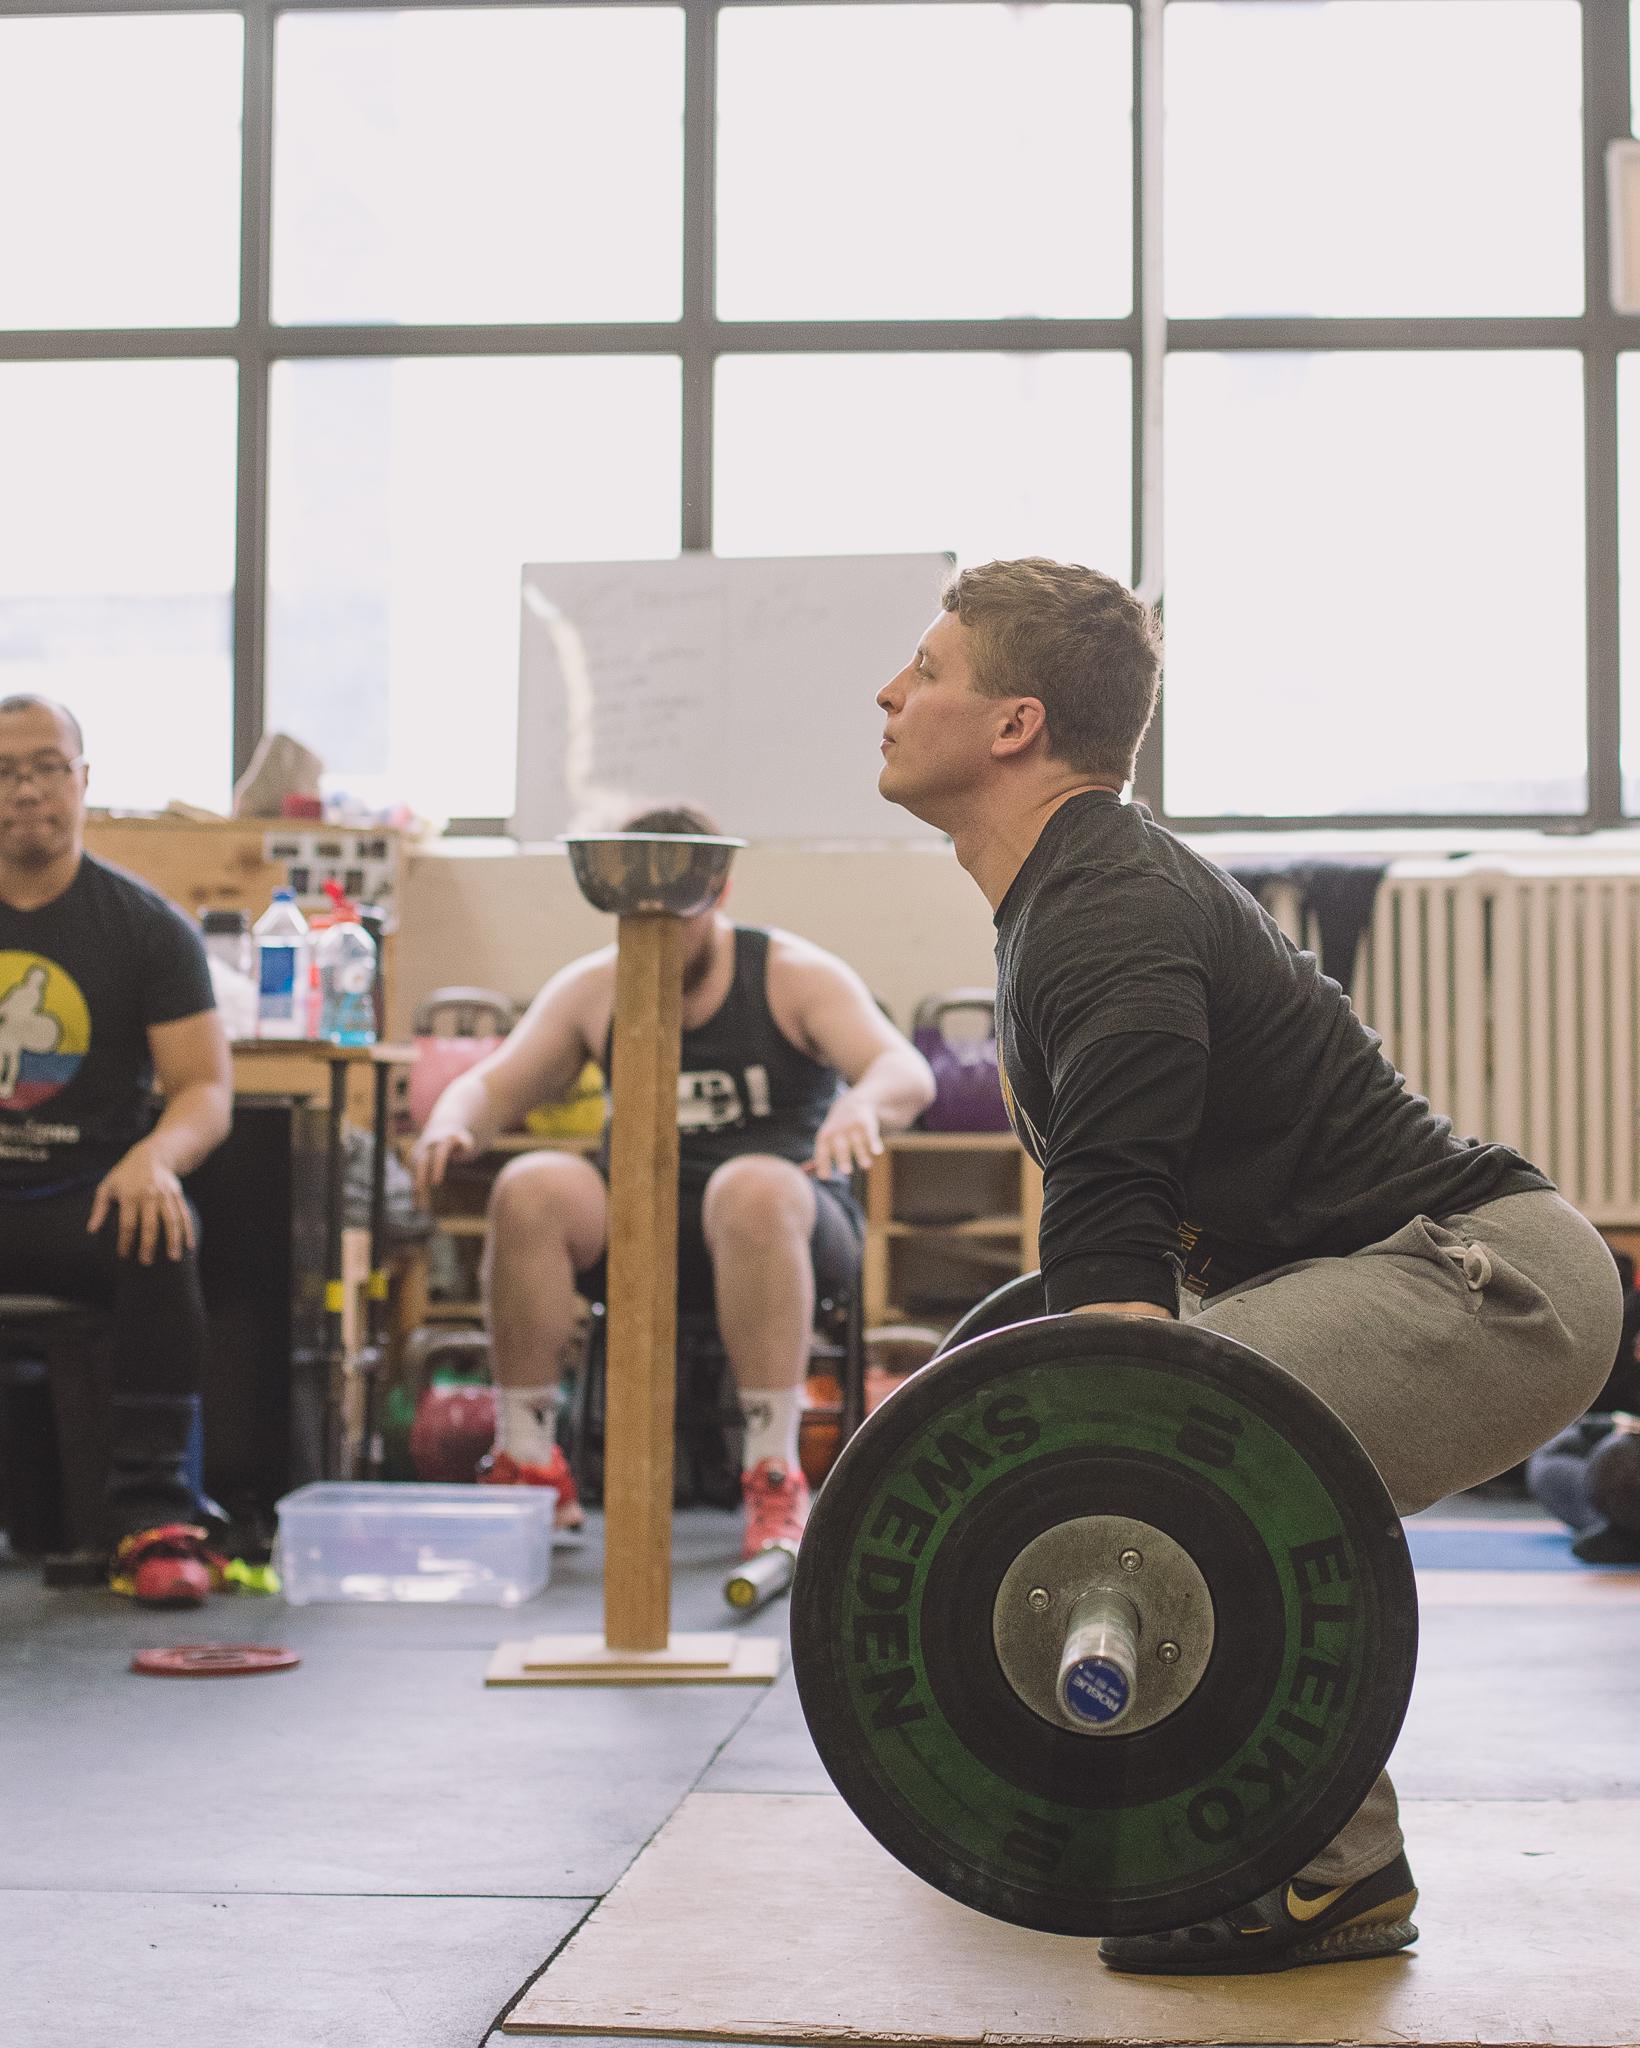 dan-casey-nywa-jdi-visit-weightlifting-coach-new-york-weightlifting-academy-19.jpg